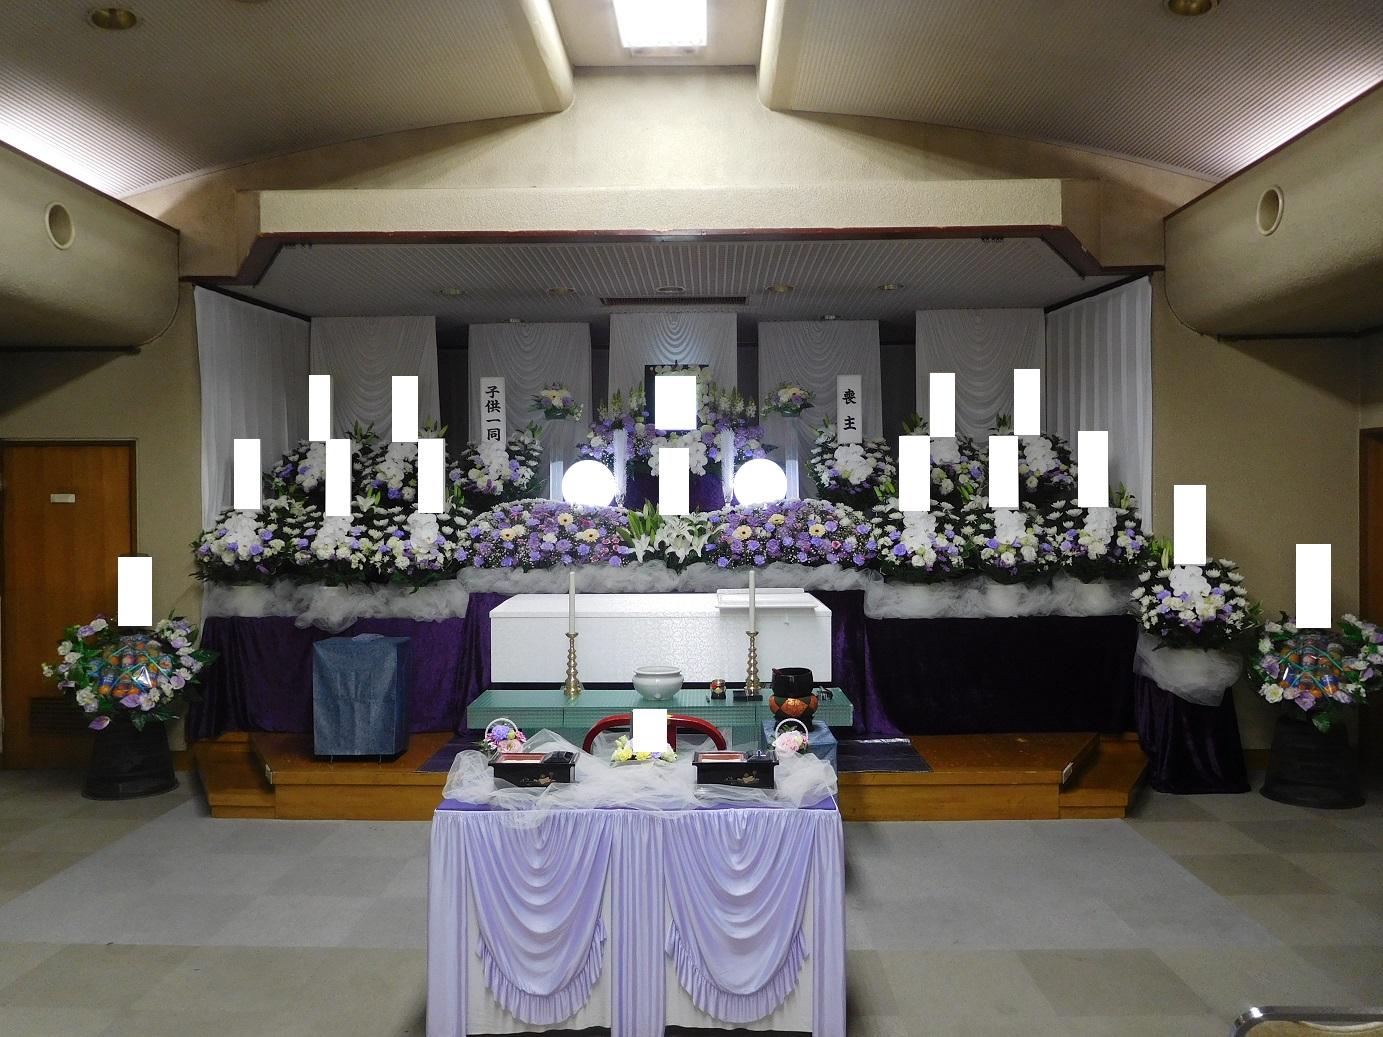 舟渡斎場で会員価格38万の家族葬